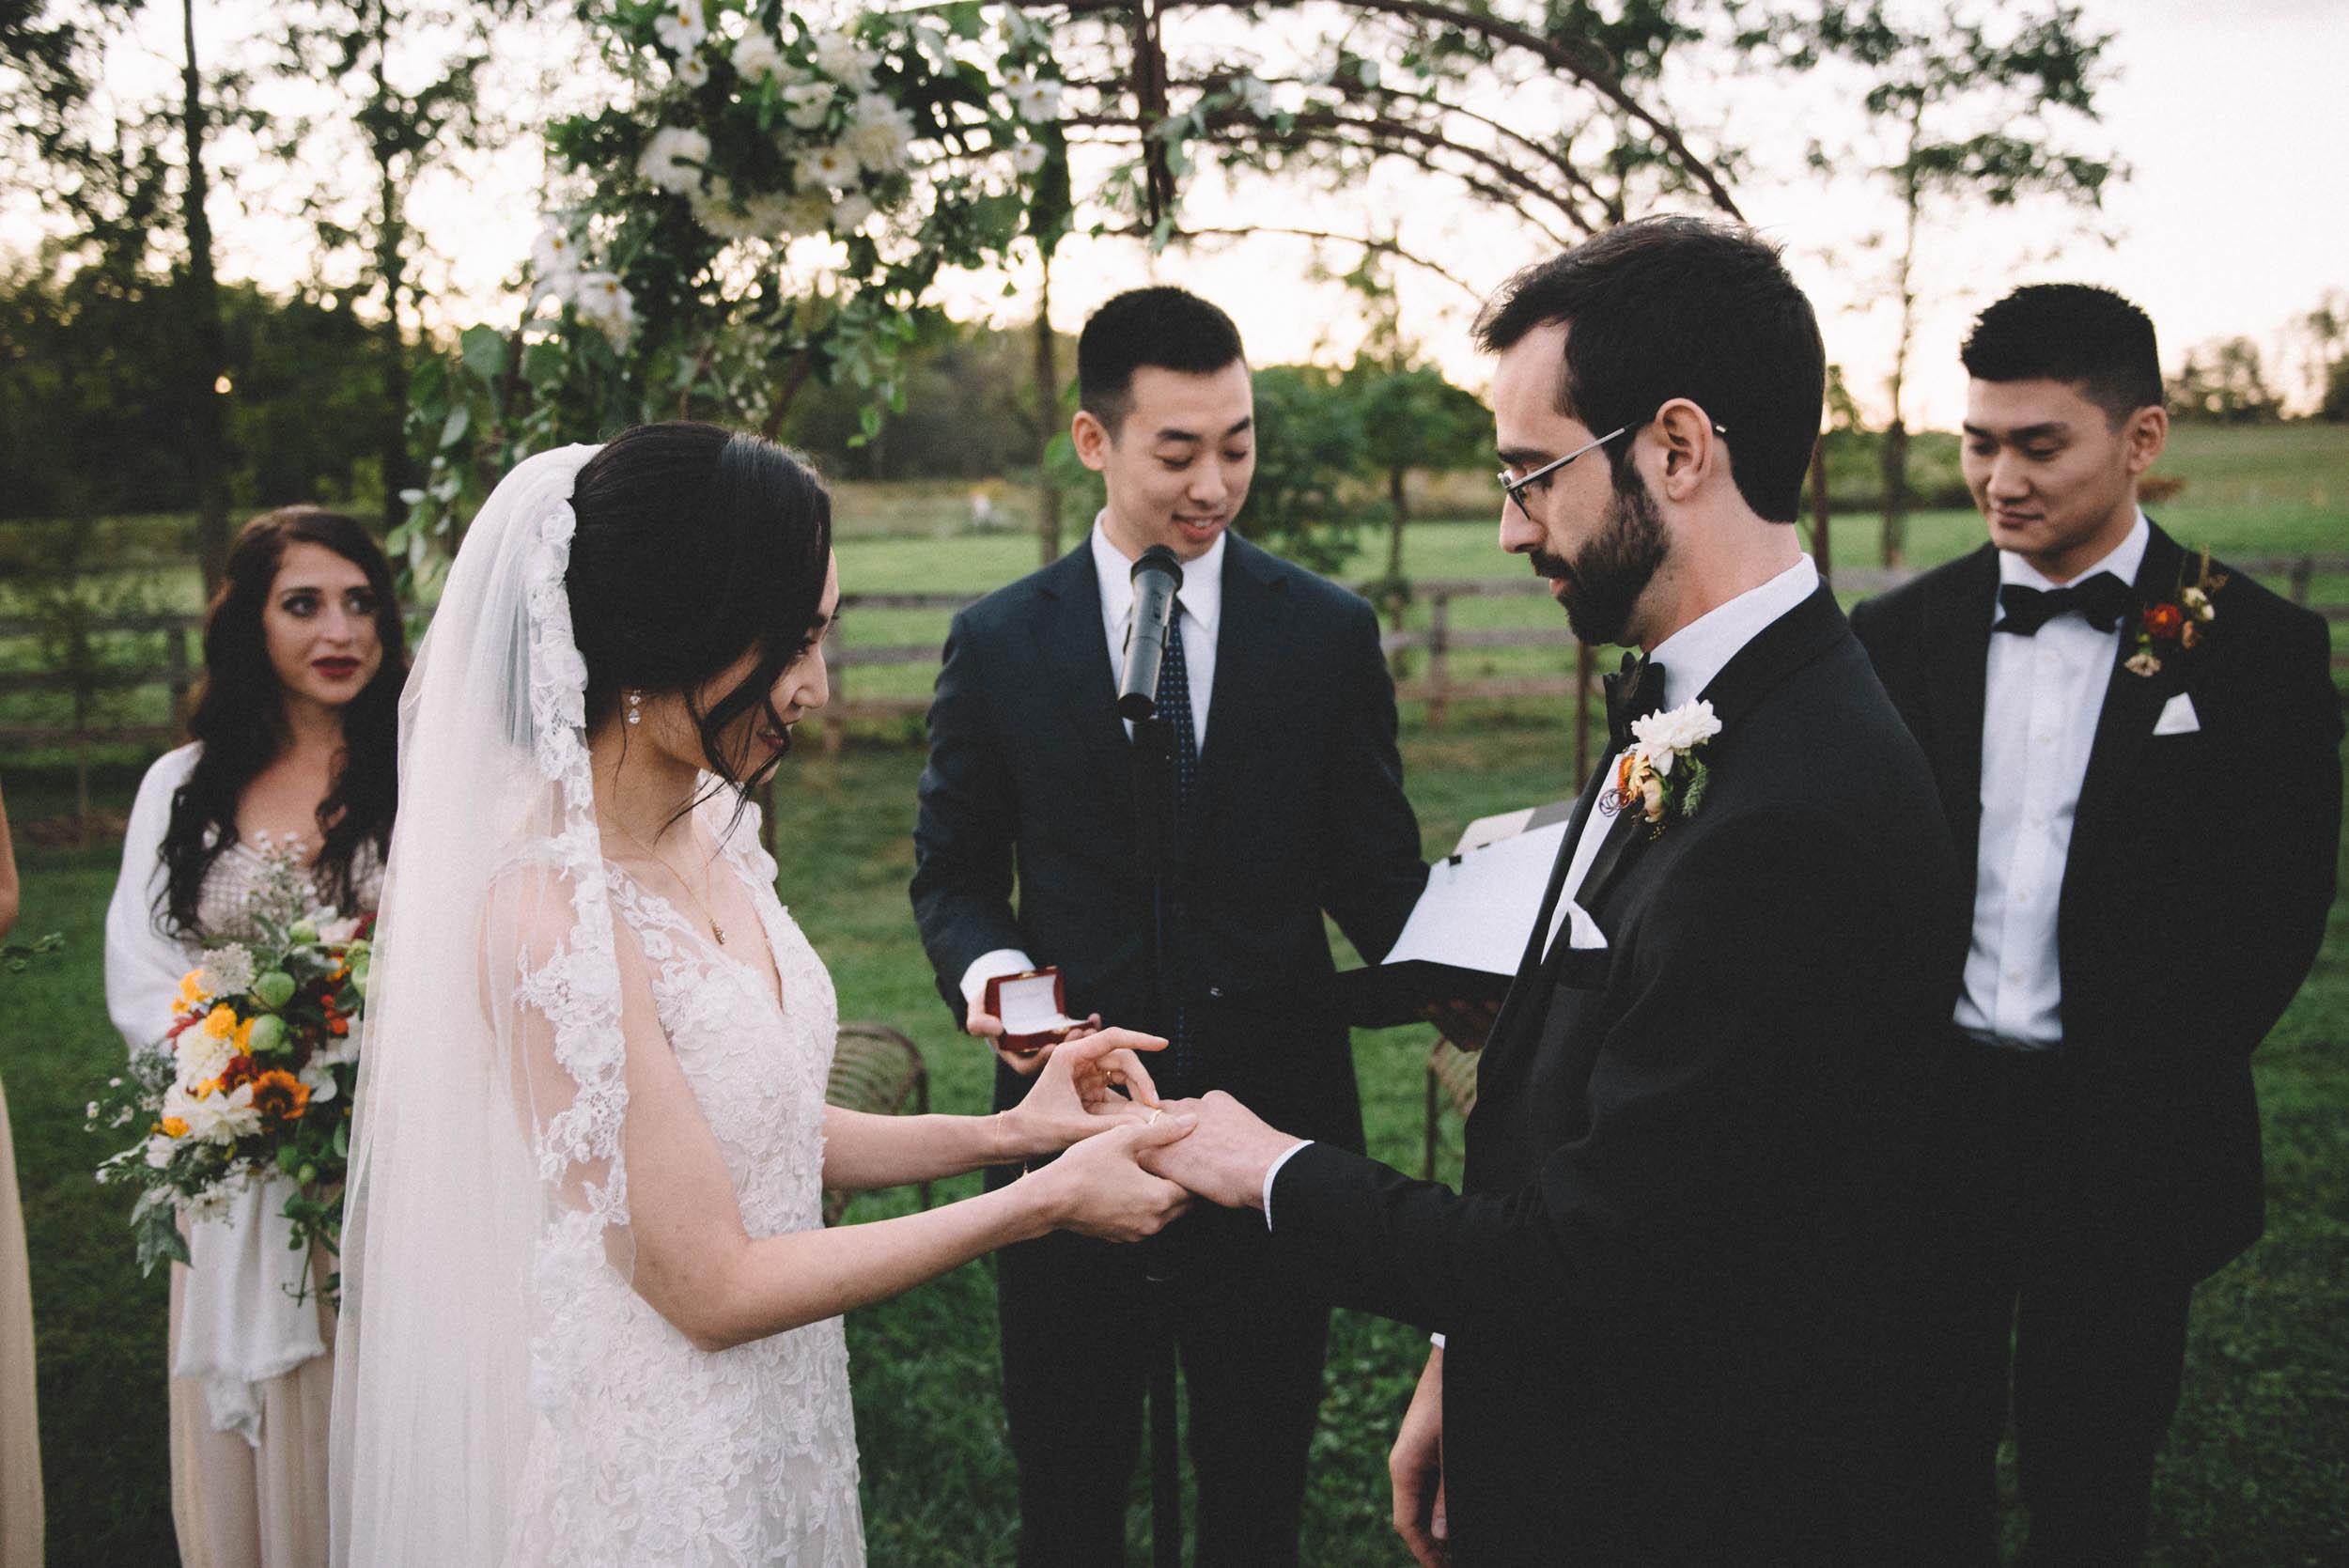 poolseville-maryland-wedding-photographer-50.jpg